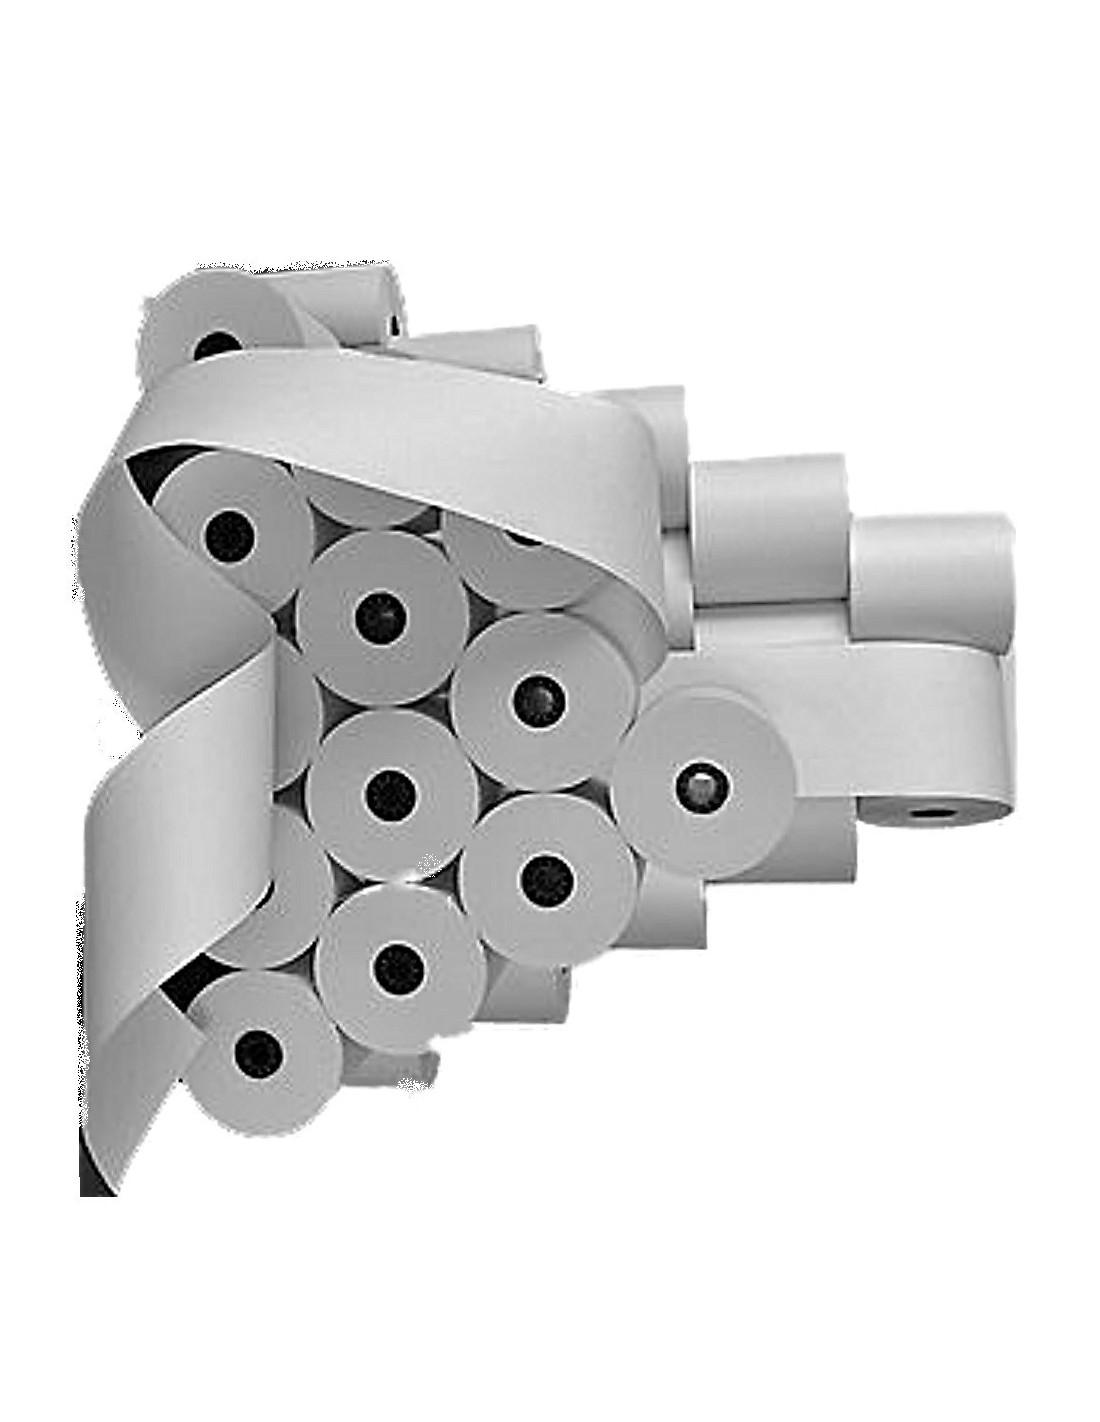 Thermo Kassenrollen 57//35//12 /Ø 55mm Bisphenol-A frei 50 Thermorollen f/ür Zyxel SP 350E BPA zertifizierte HKR-Welt/® Bonrollen aus Thermopapier